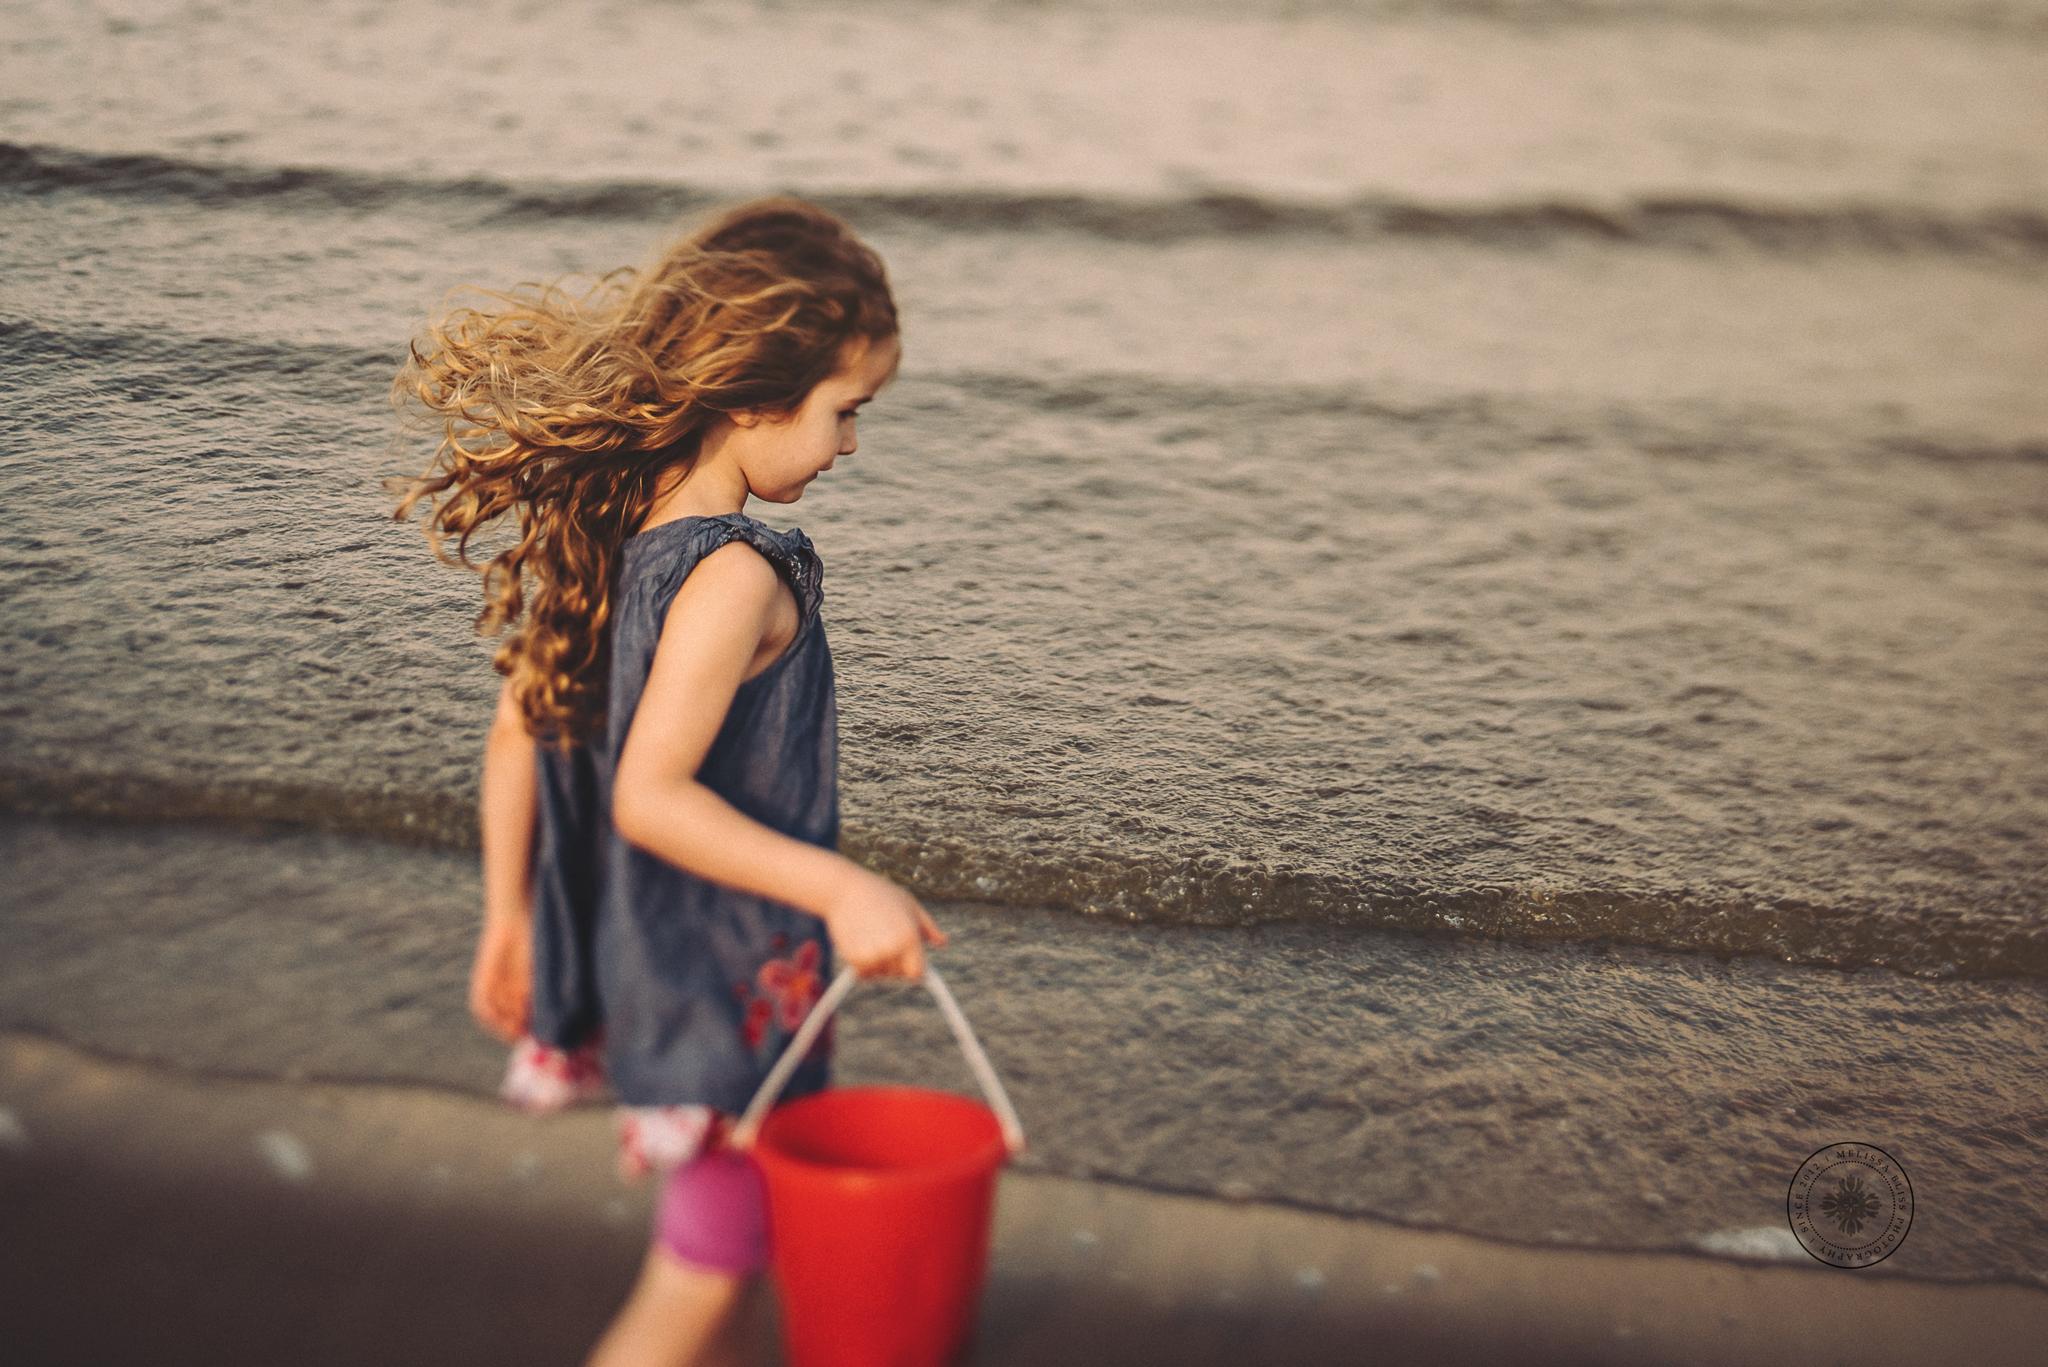 virginia-beach-lifestyle-photographer-beach-photos-norfolk--girl-collecting-seashells-melissa-bliss-photography